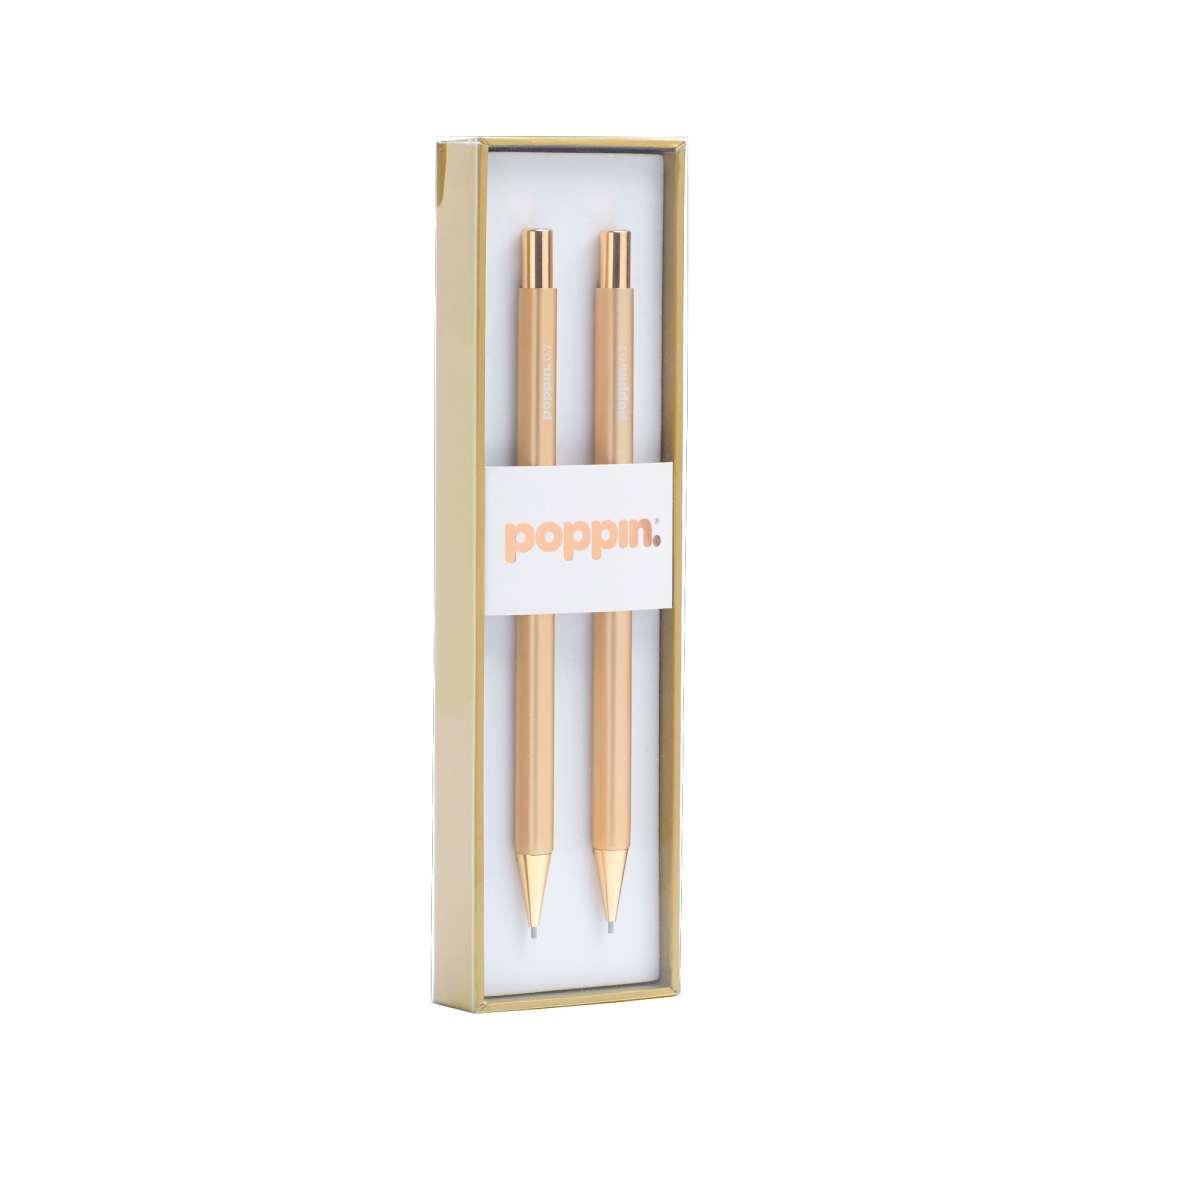 Gilded mechanical pencils